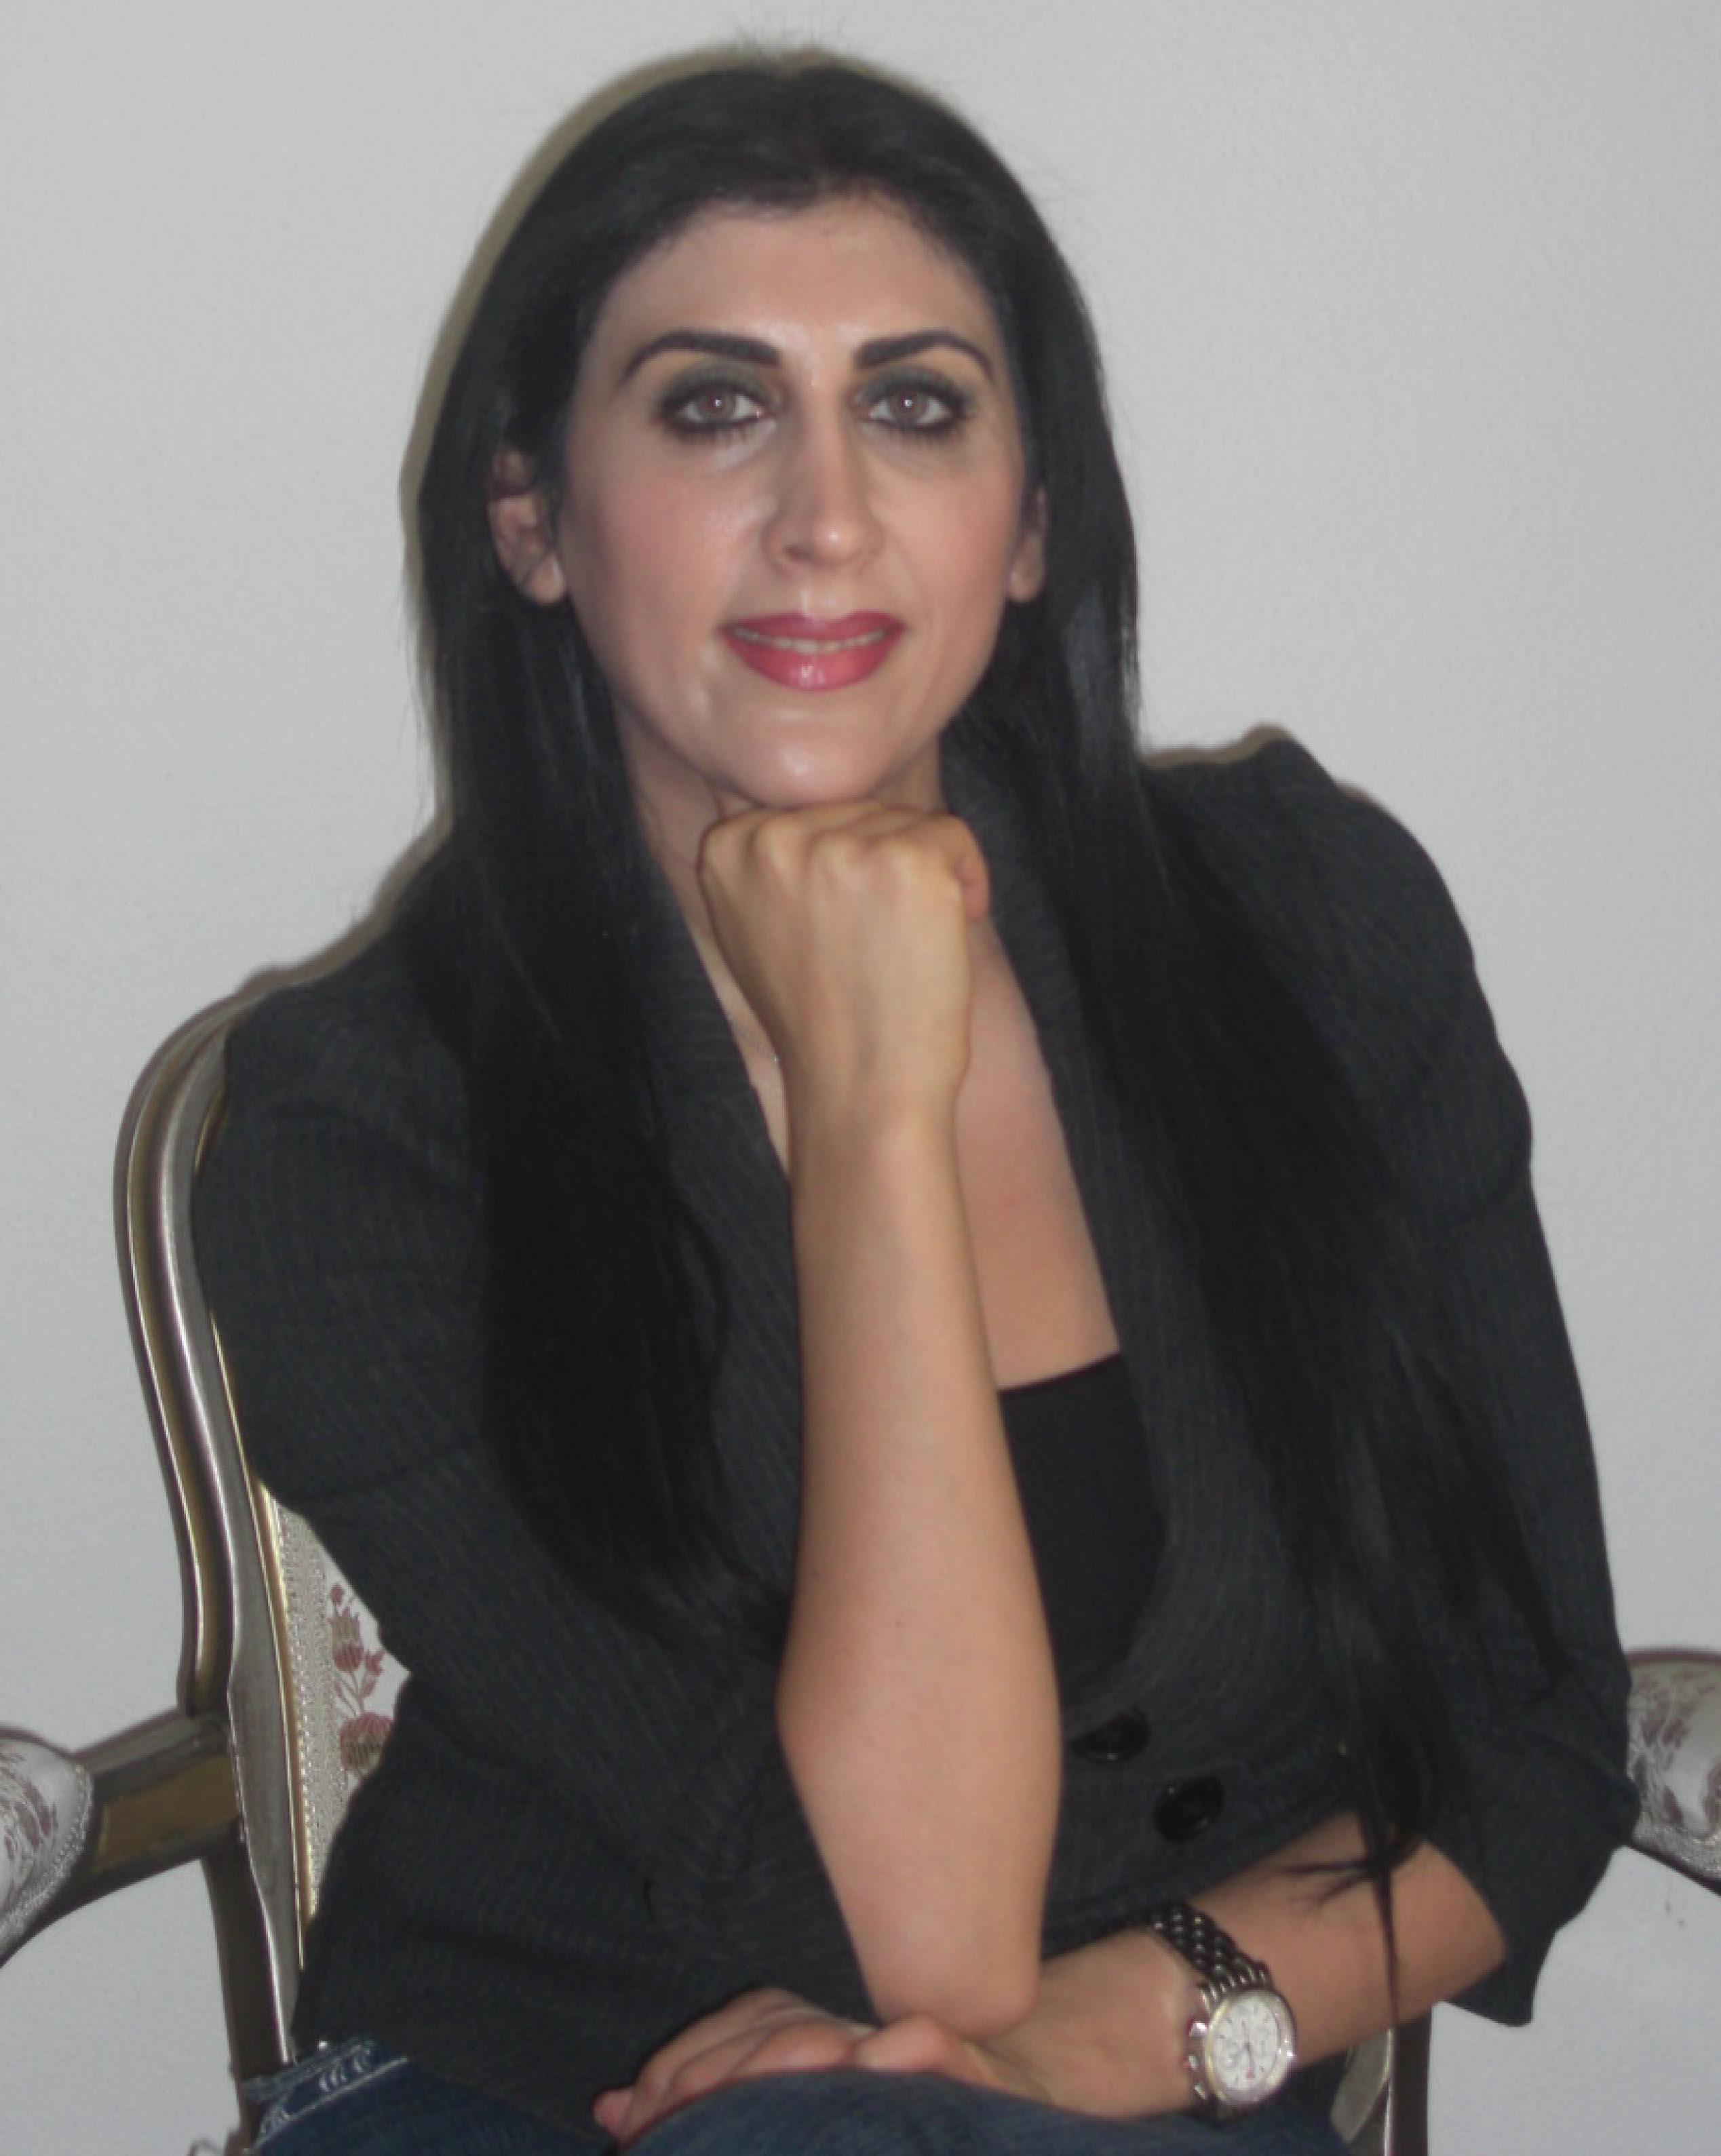 Psychologist Los Angeles, Encino, Tarzana